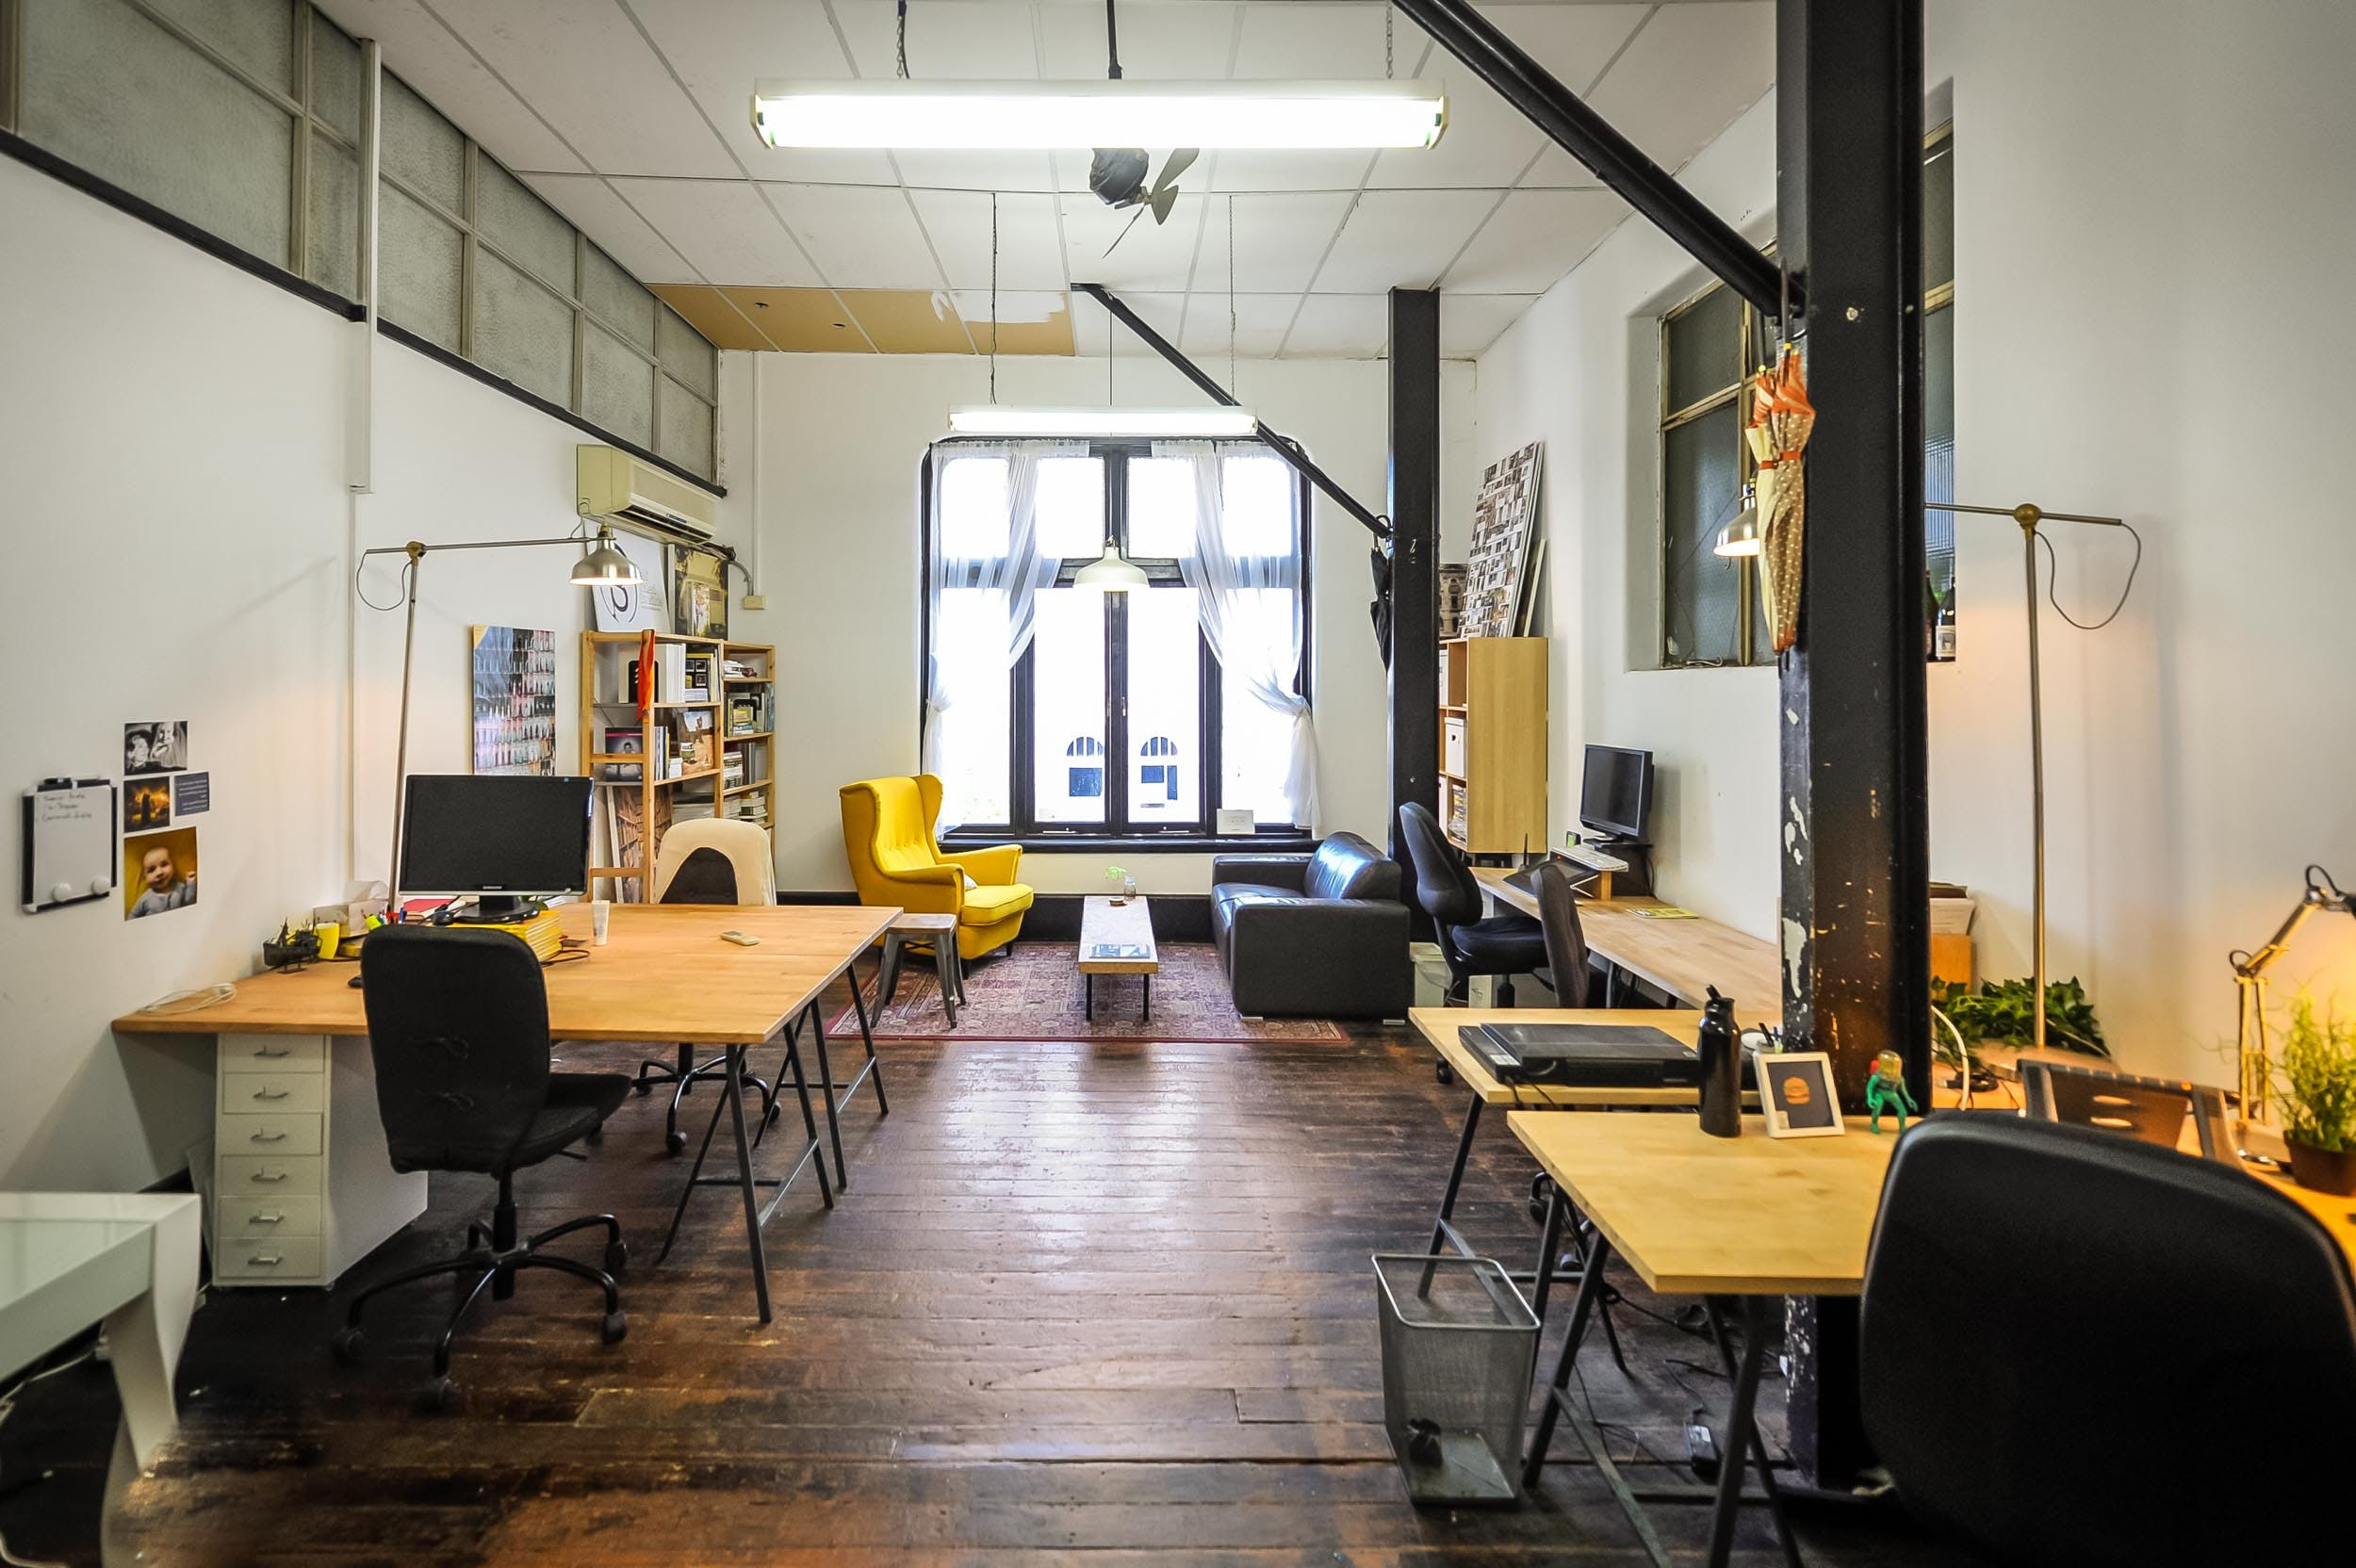 Dedicated desk at MOCO - Moana Collaborative, image 1